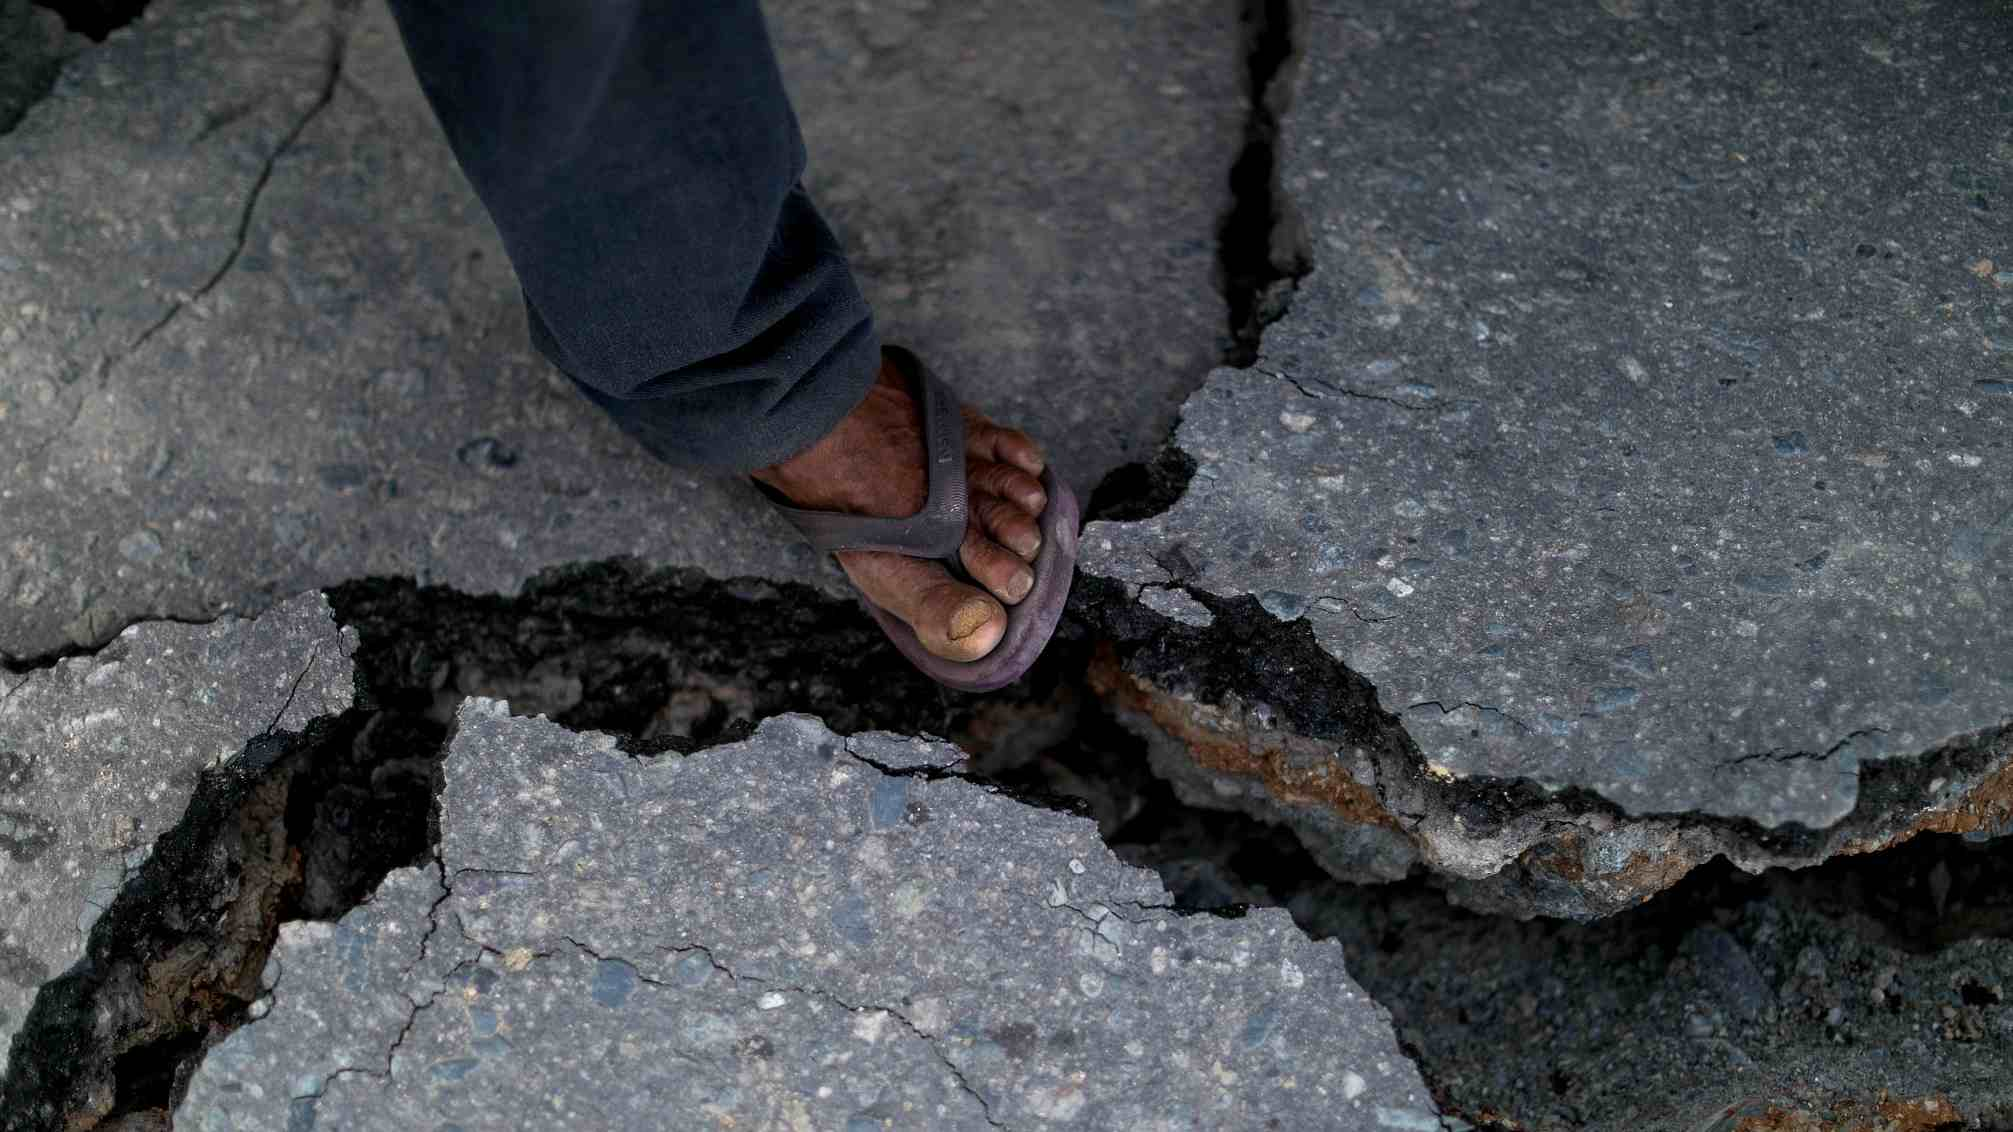 6.1-magnitude quake jolts western Indonesia